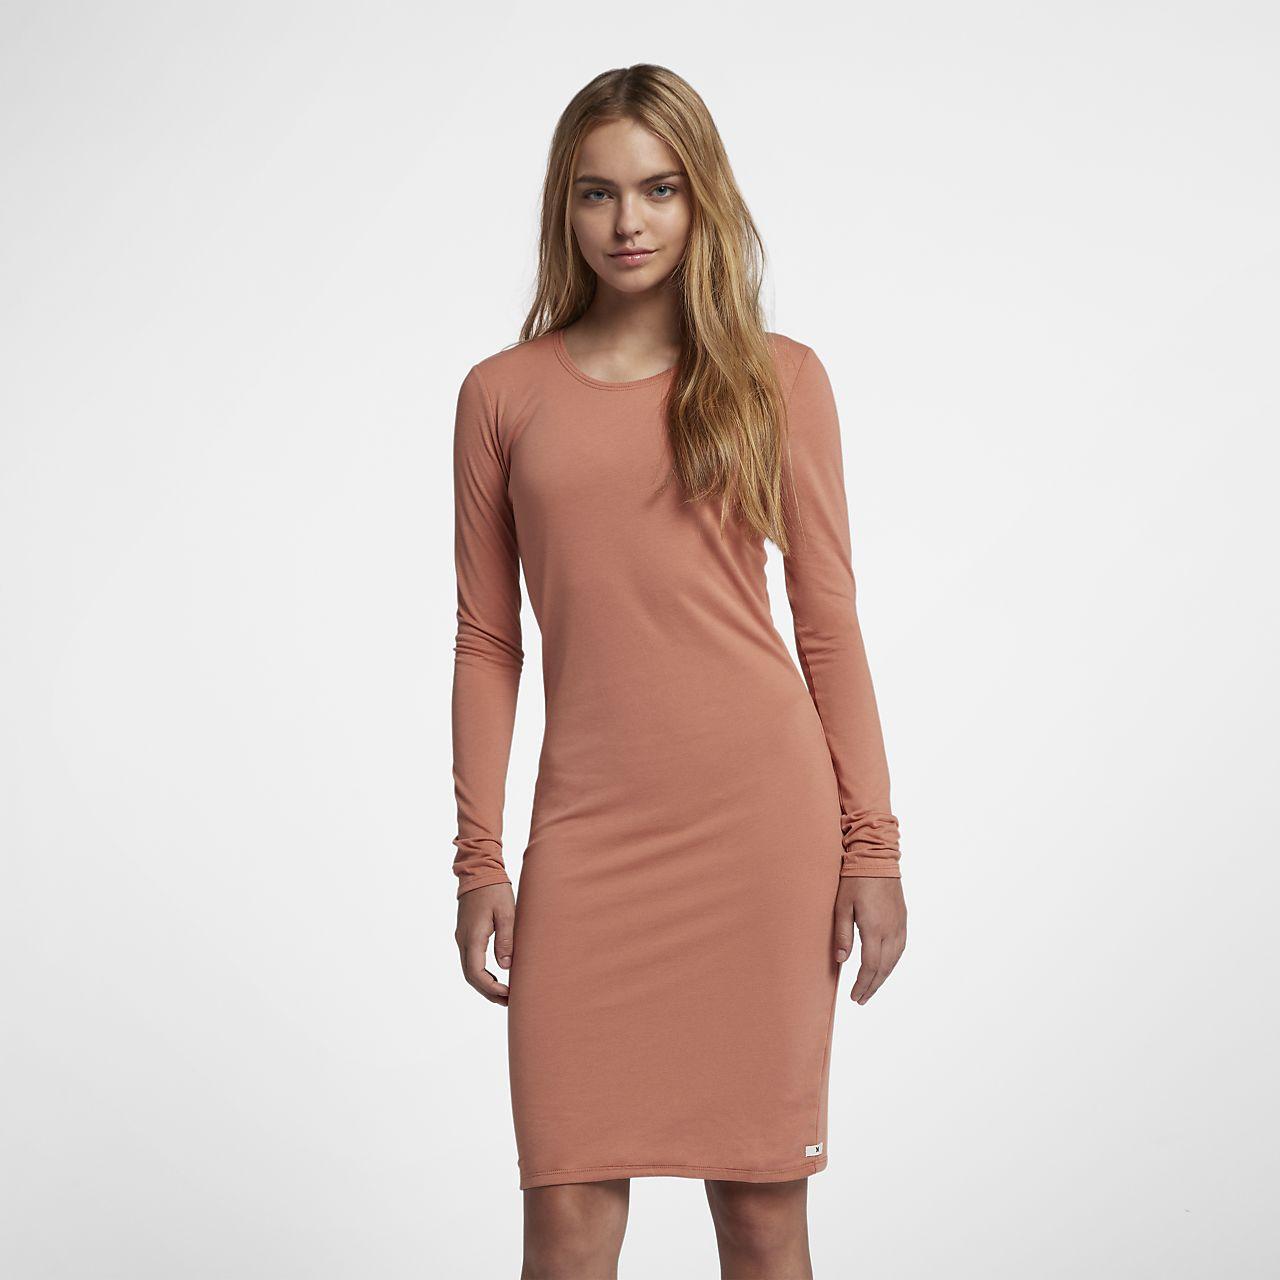 Hurley Dri-FIT Women s Long-Sleeve Dress. Nike.com a5a8d62bd8